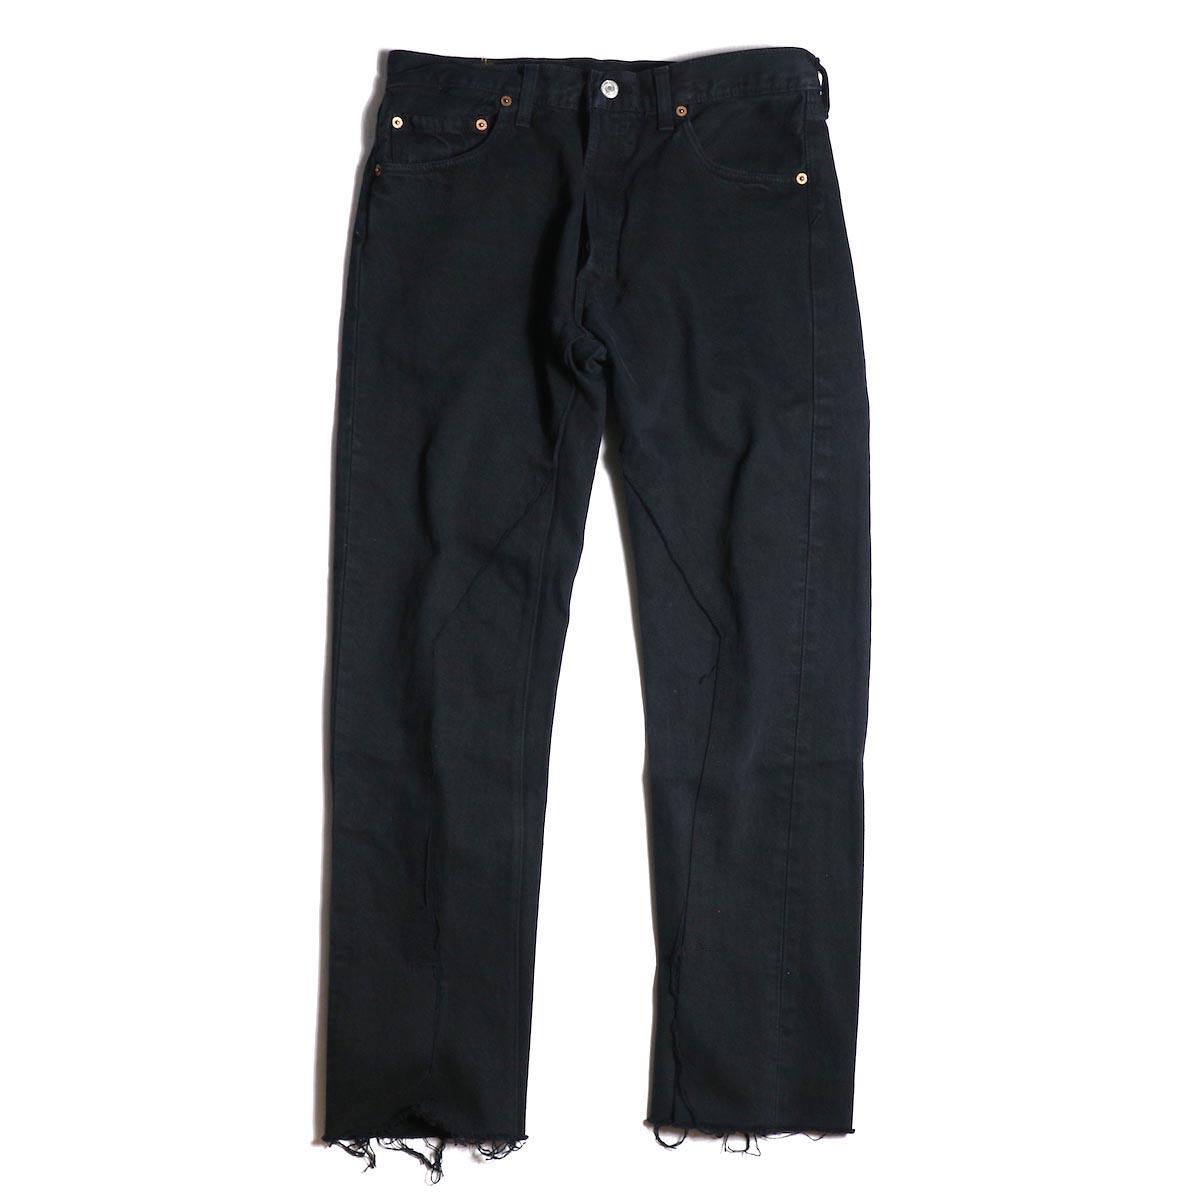 OLD PARK / SLIT JEANS (M size) -typeA